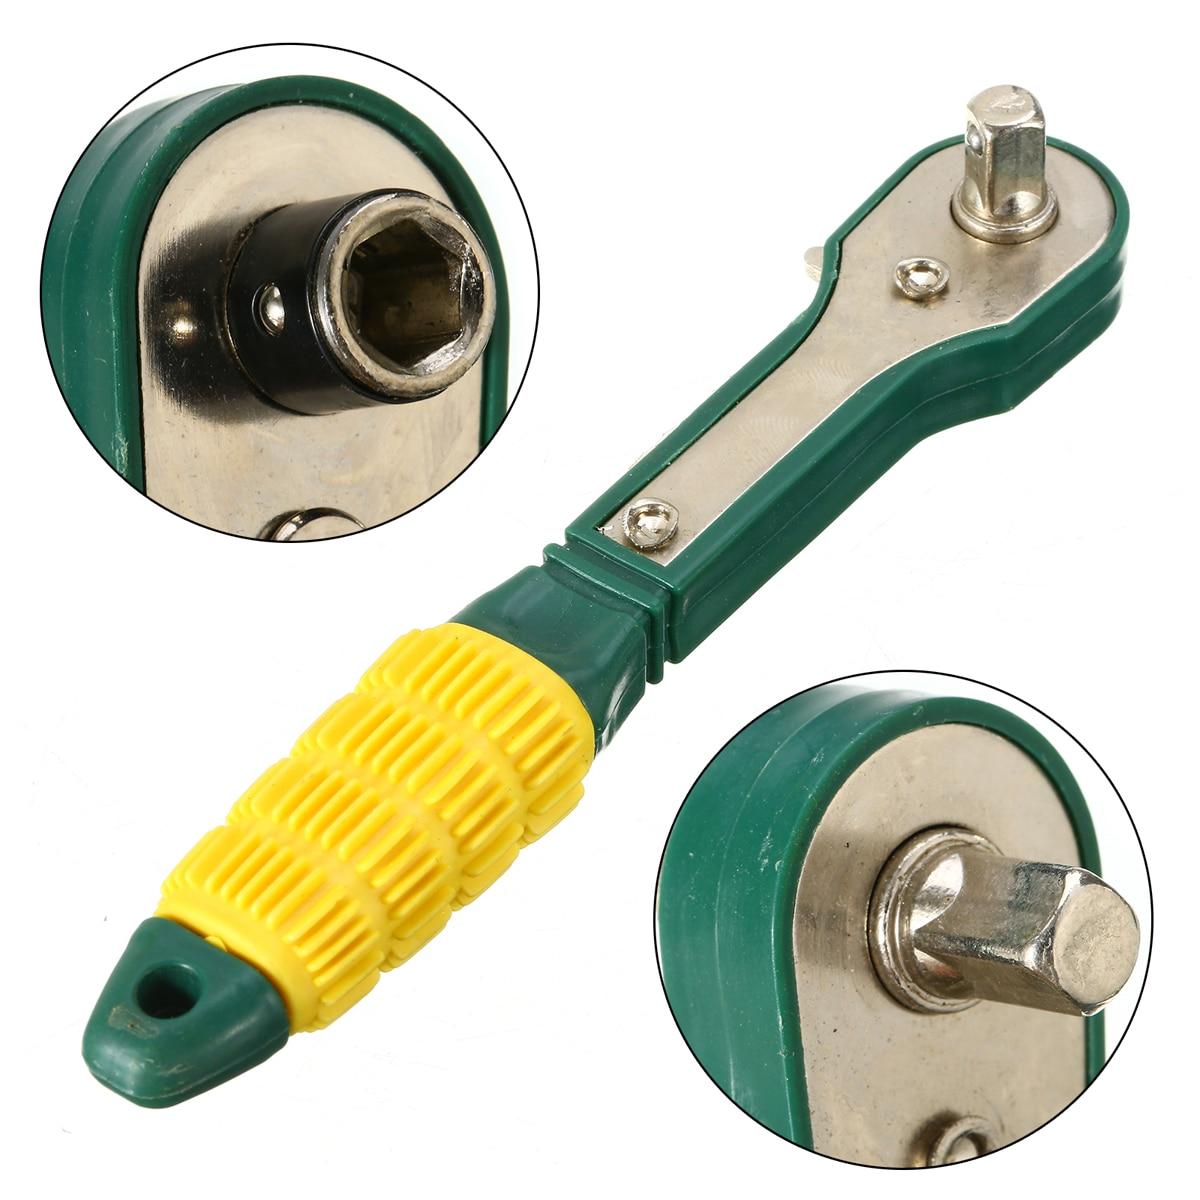 Sheet Metal Tools Set 1pc Mini Rapid Ratchet Socket Wrench 1/4 Head Anti Rust Screwdriver Quick Spanner For DIY Repairing